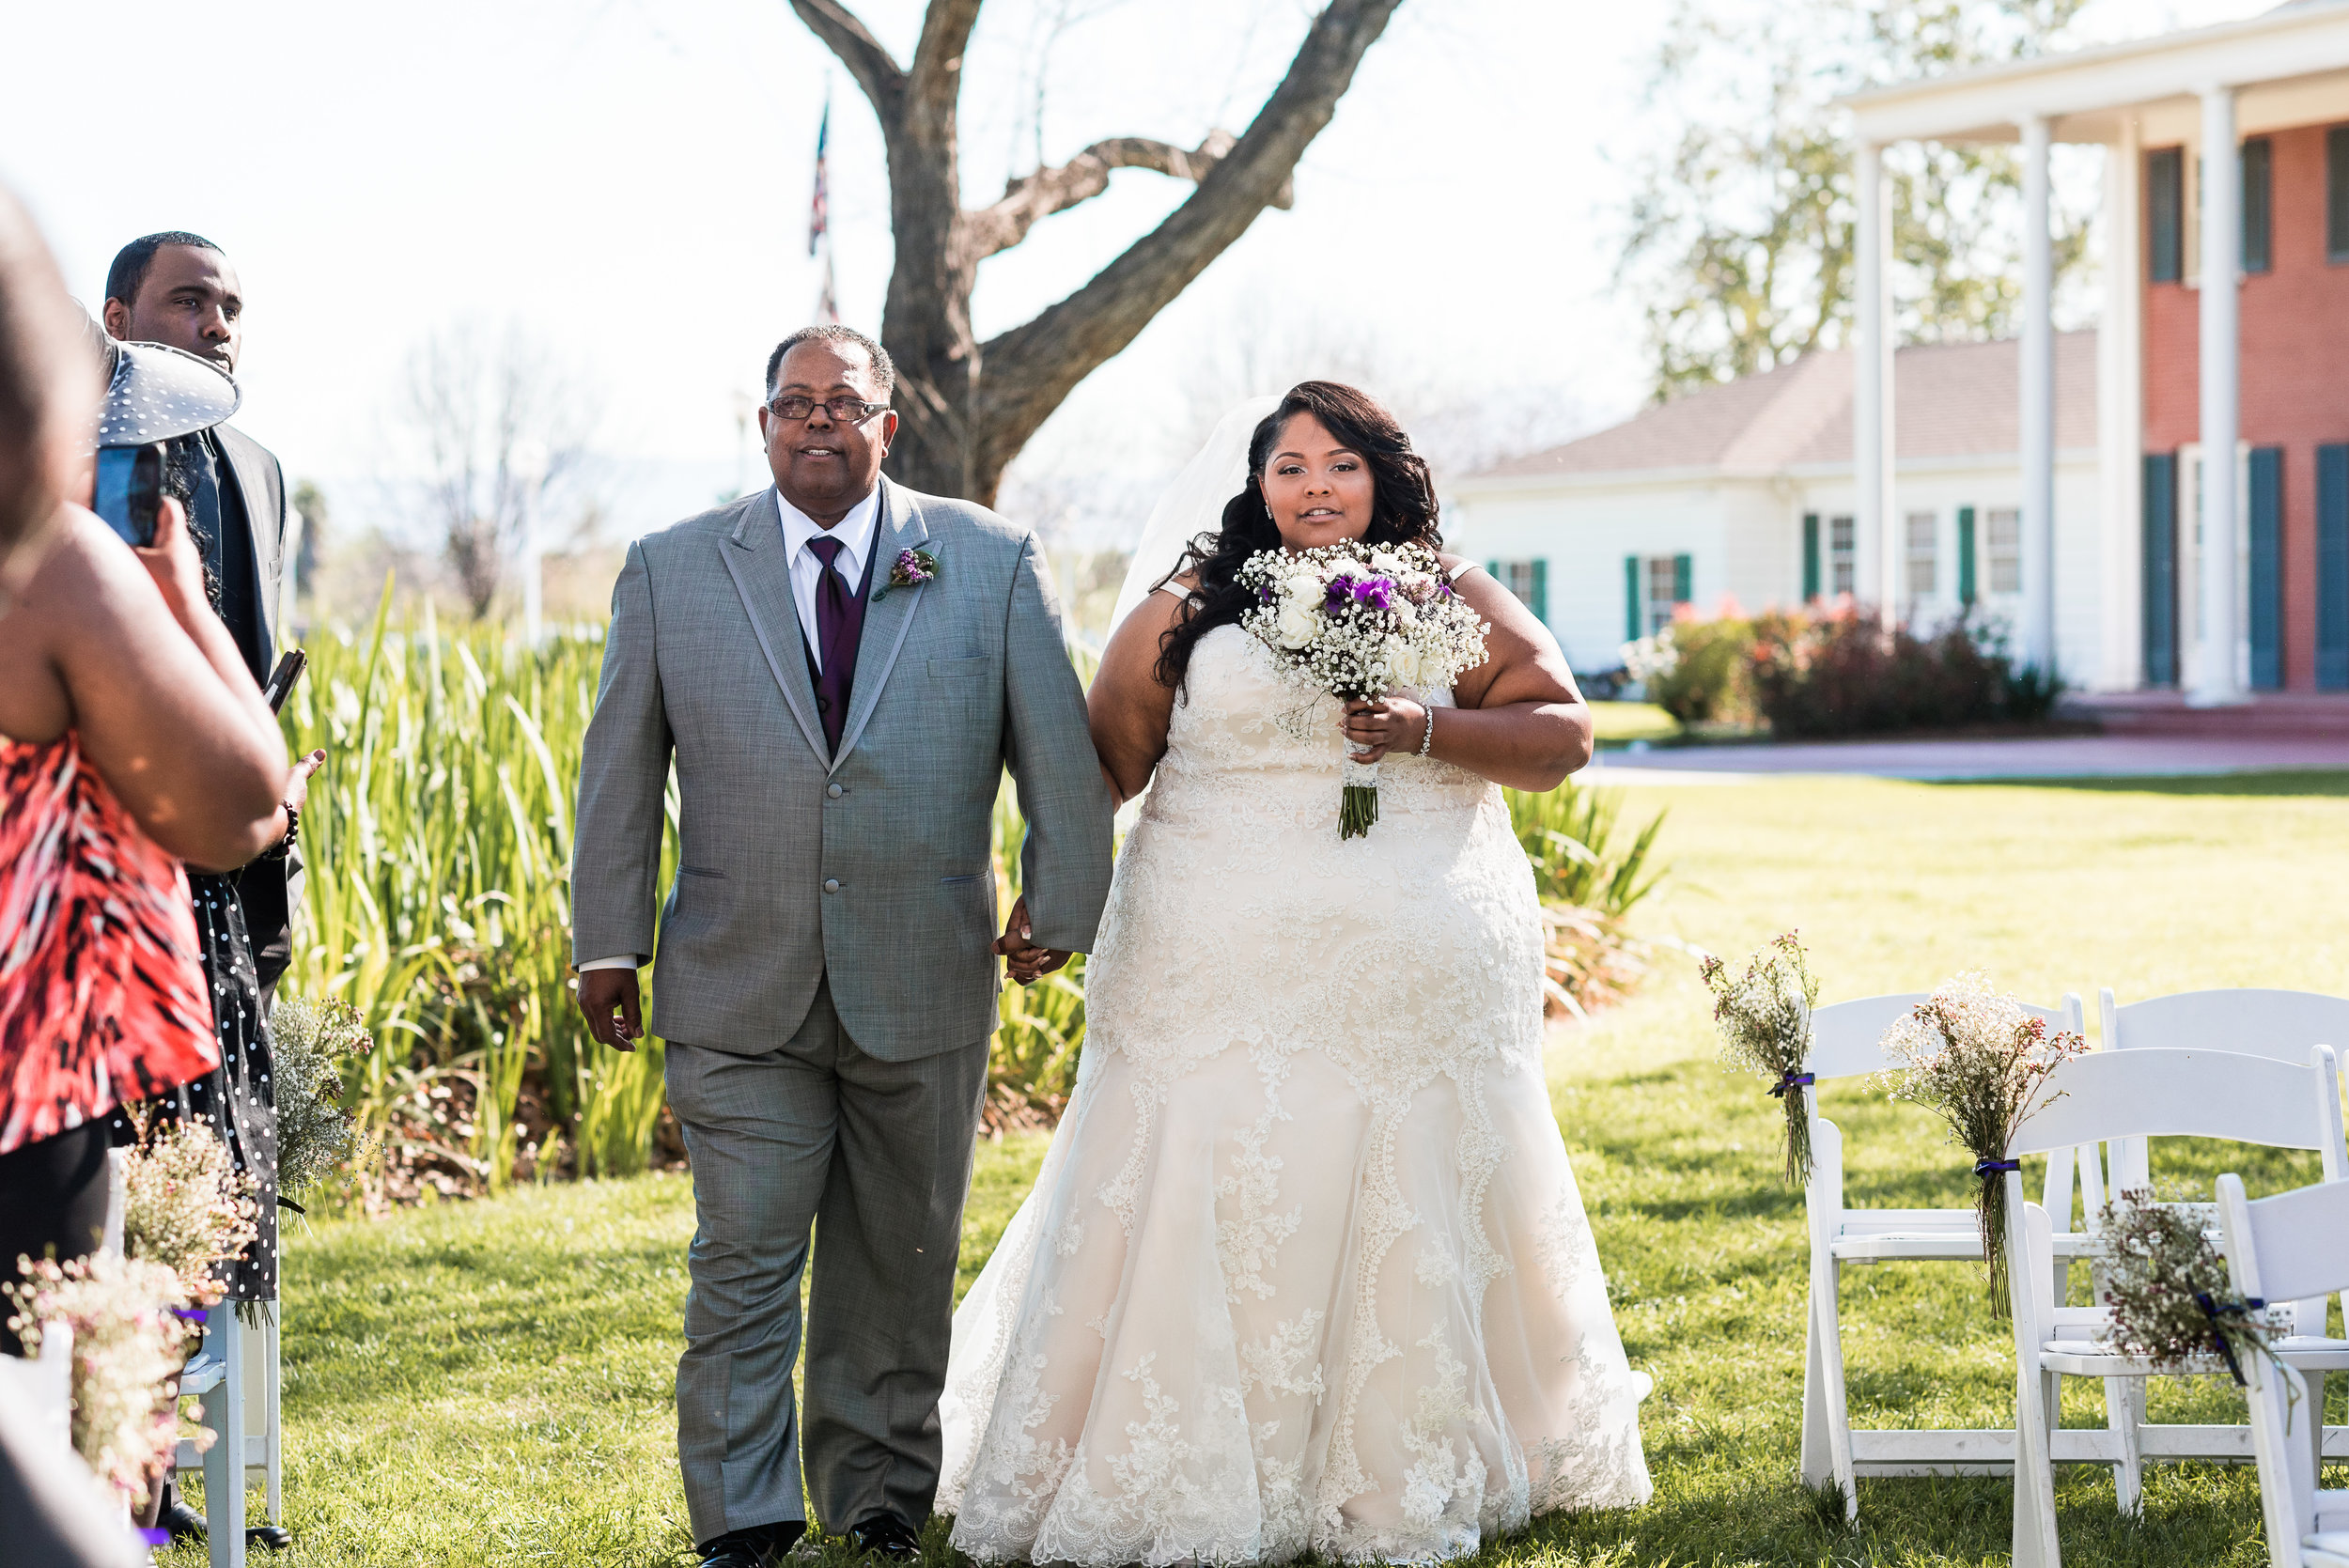 st-louis-wedding-photographer-moreno-valley-wedding-400.jpg